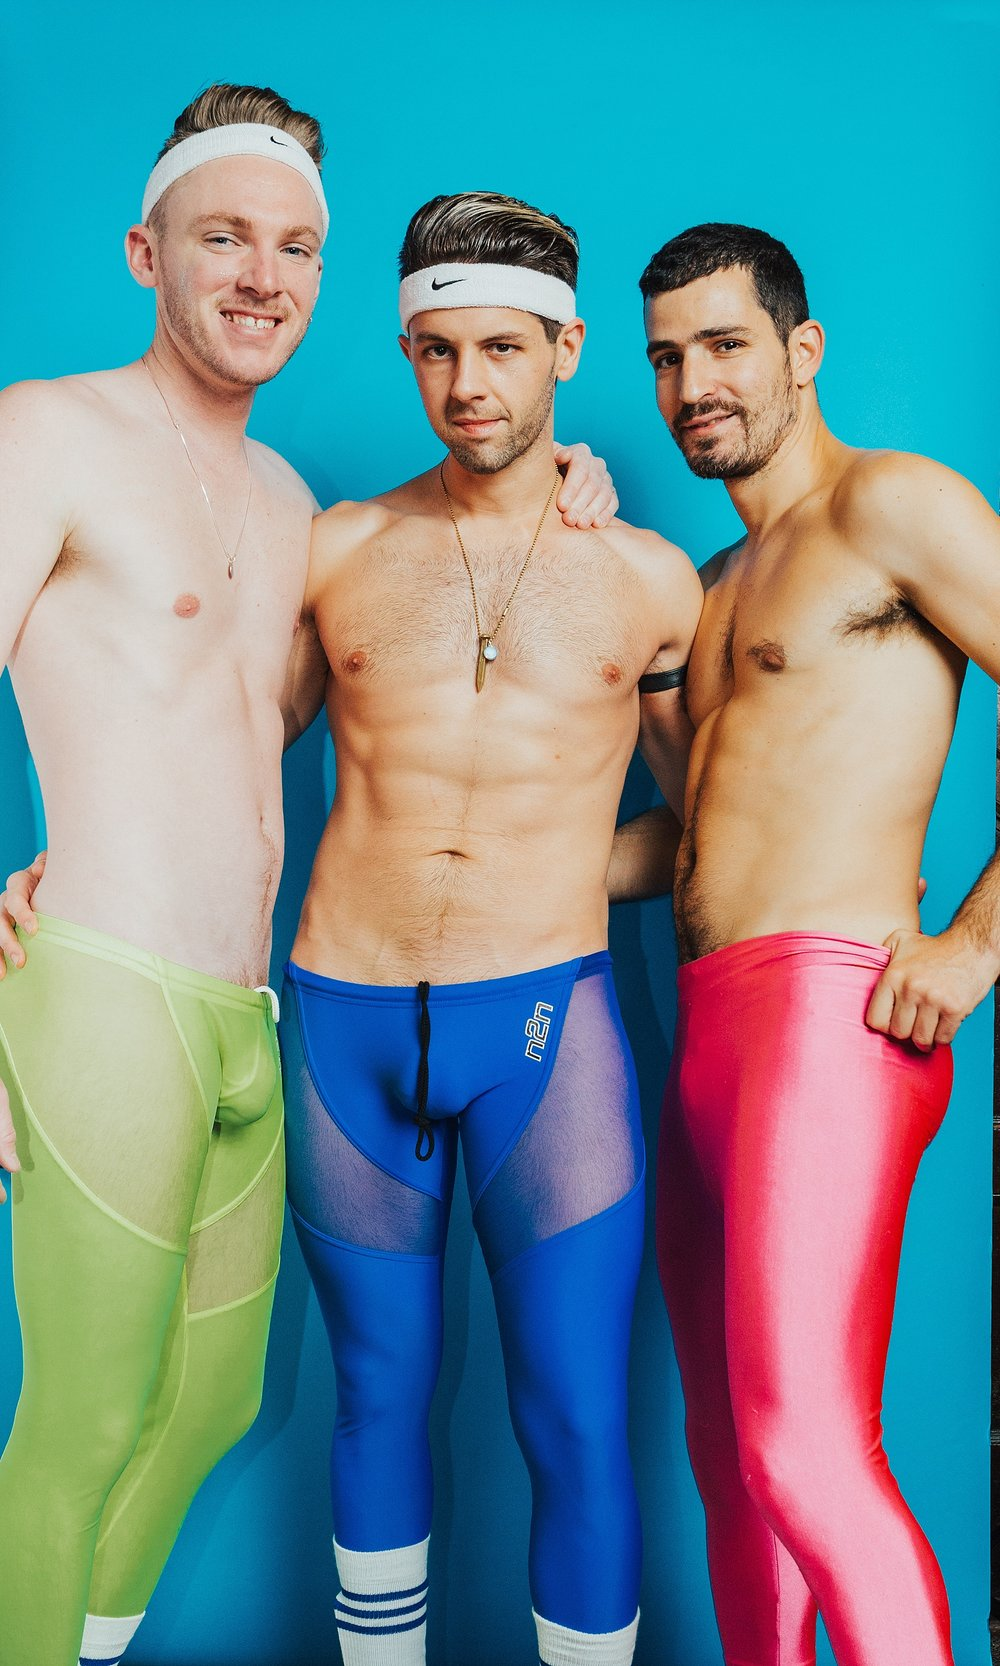 Joe_Mac_Creative_LGBT_Photographer_Philadelphia_Gay_Business__0015.jpg